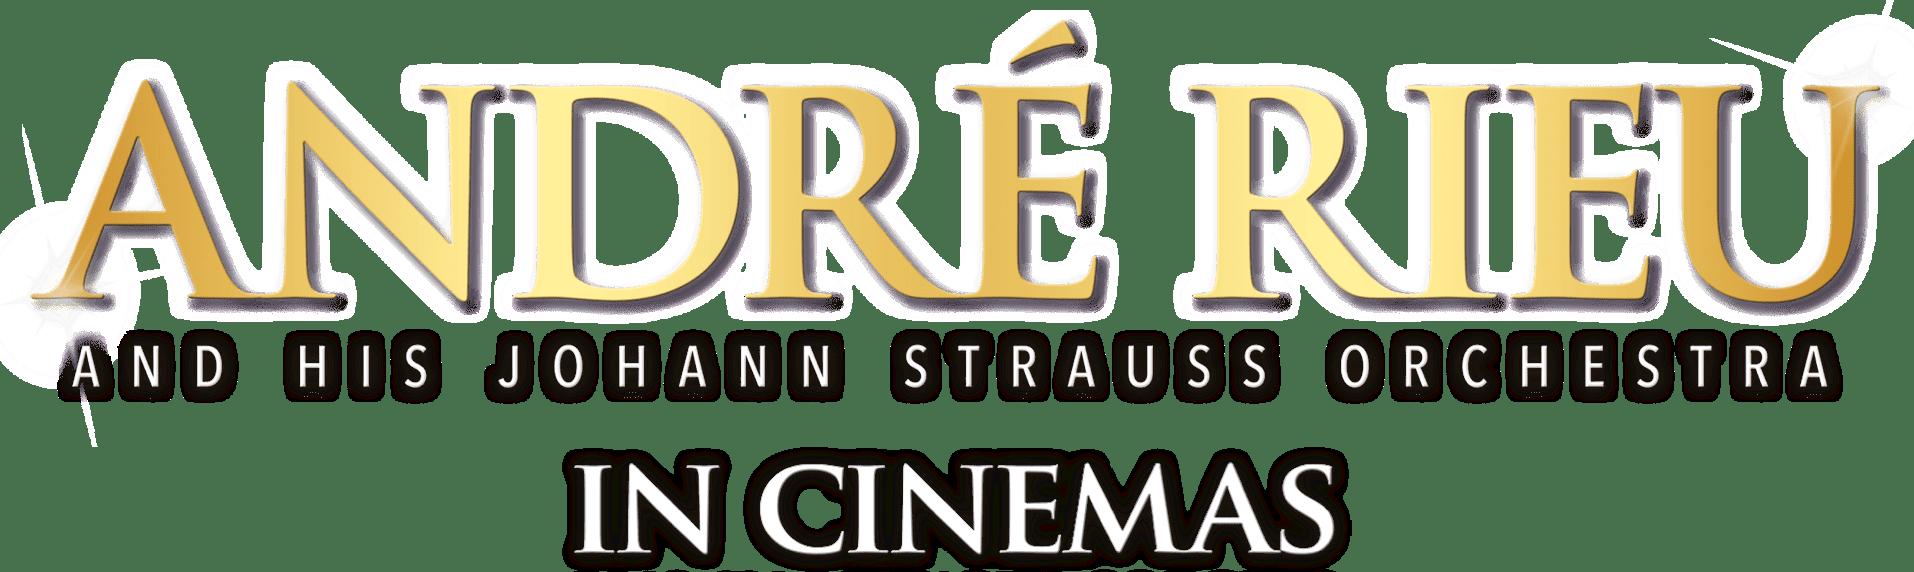 André Rieu's 2019 Maastricht Concert